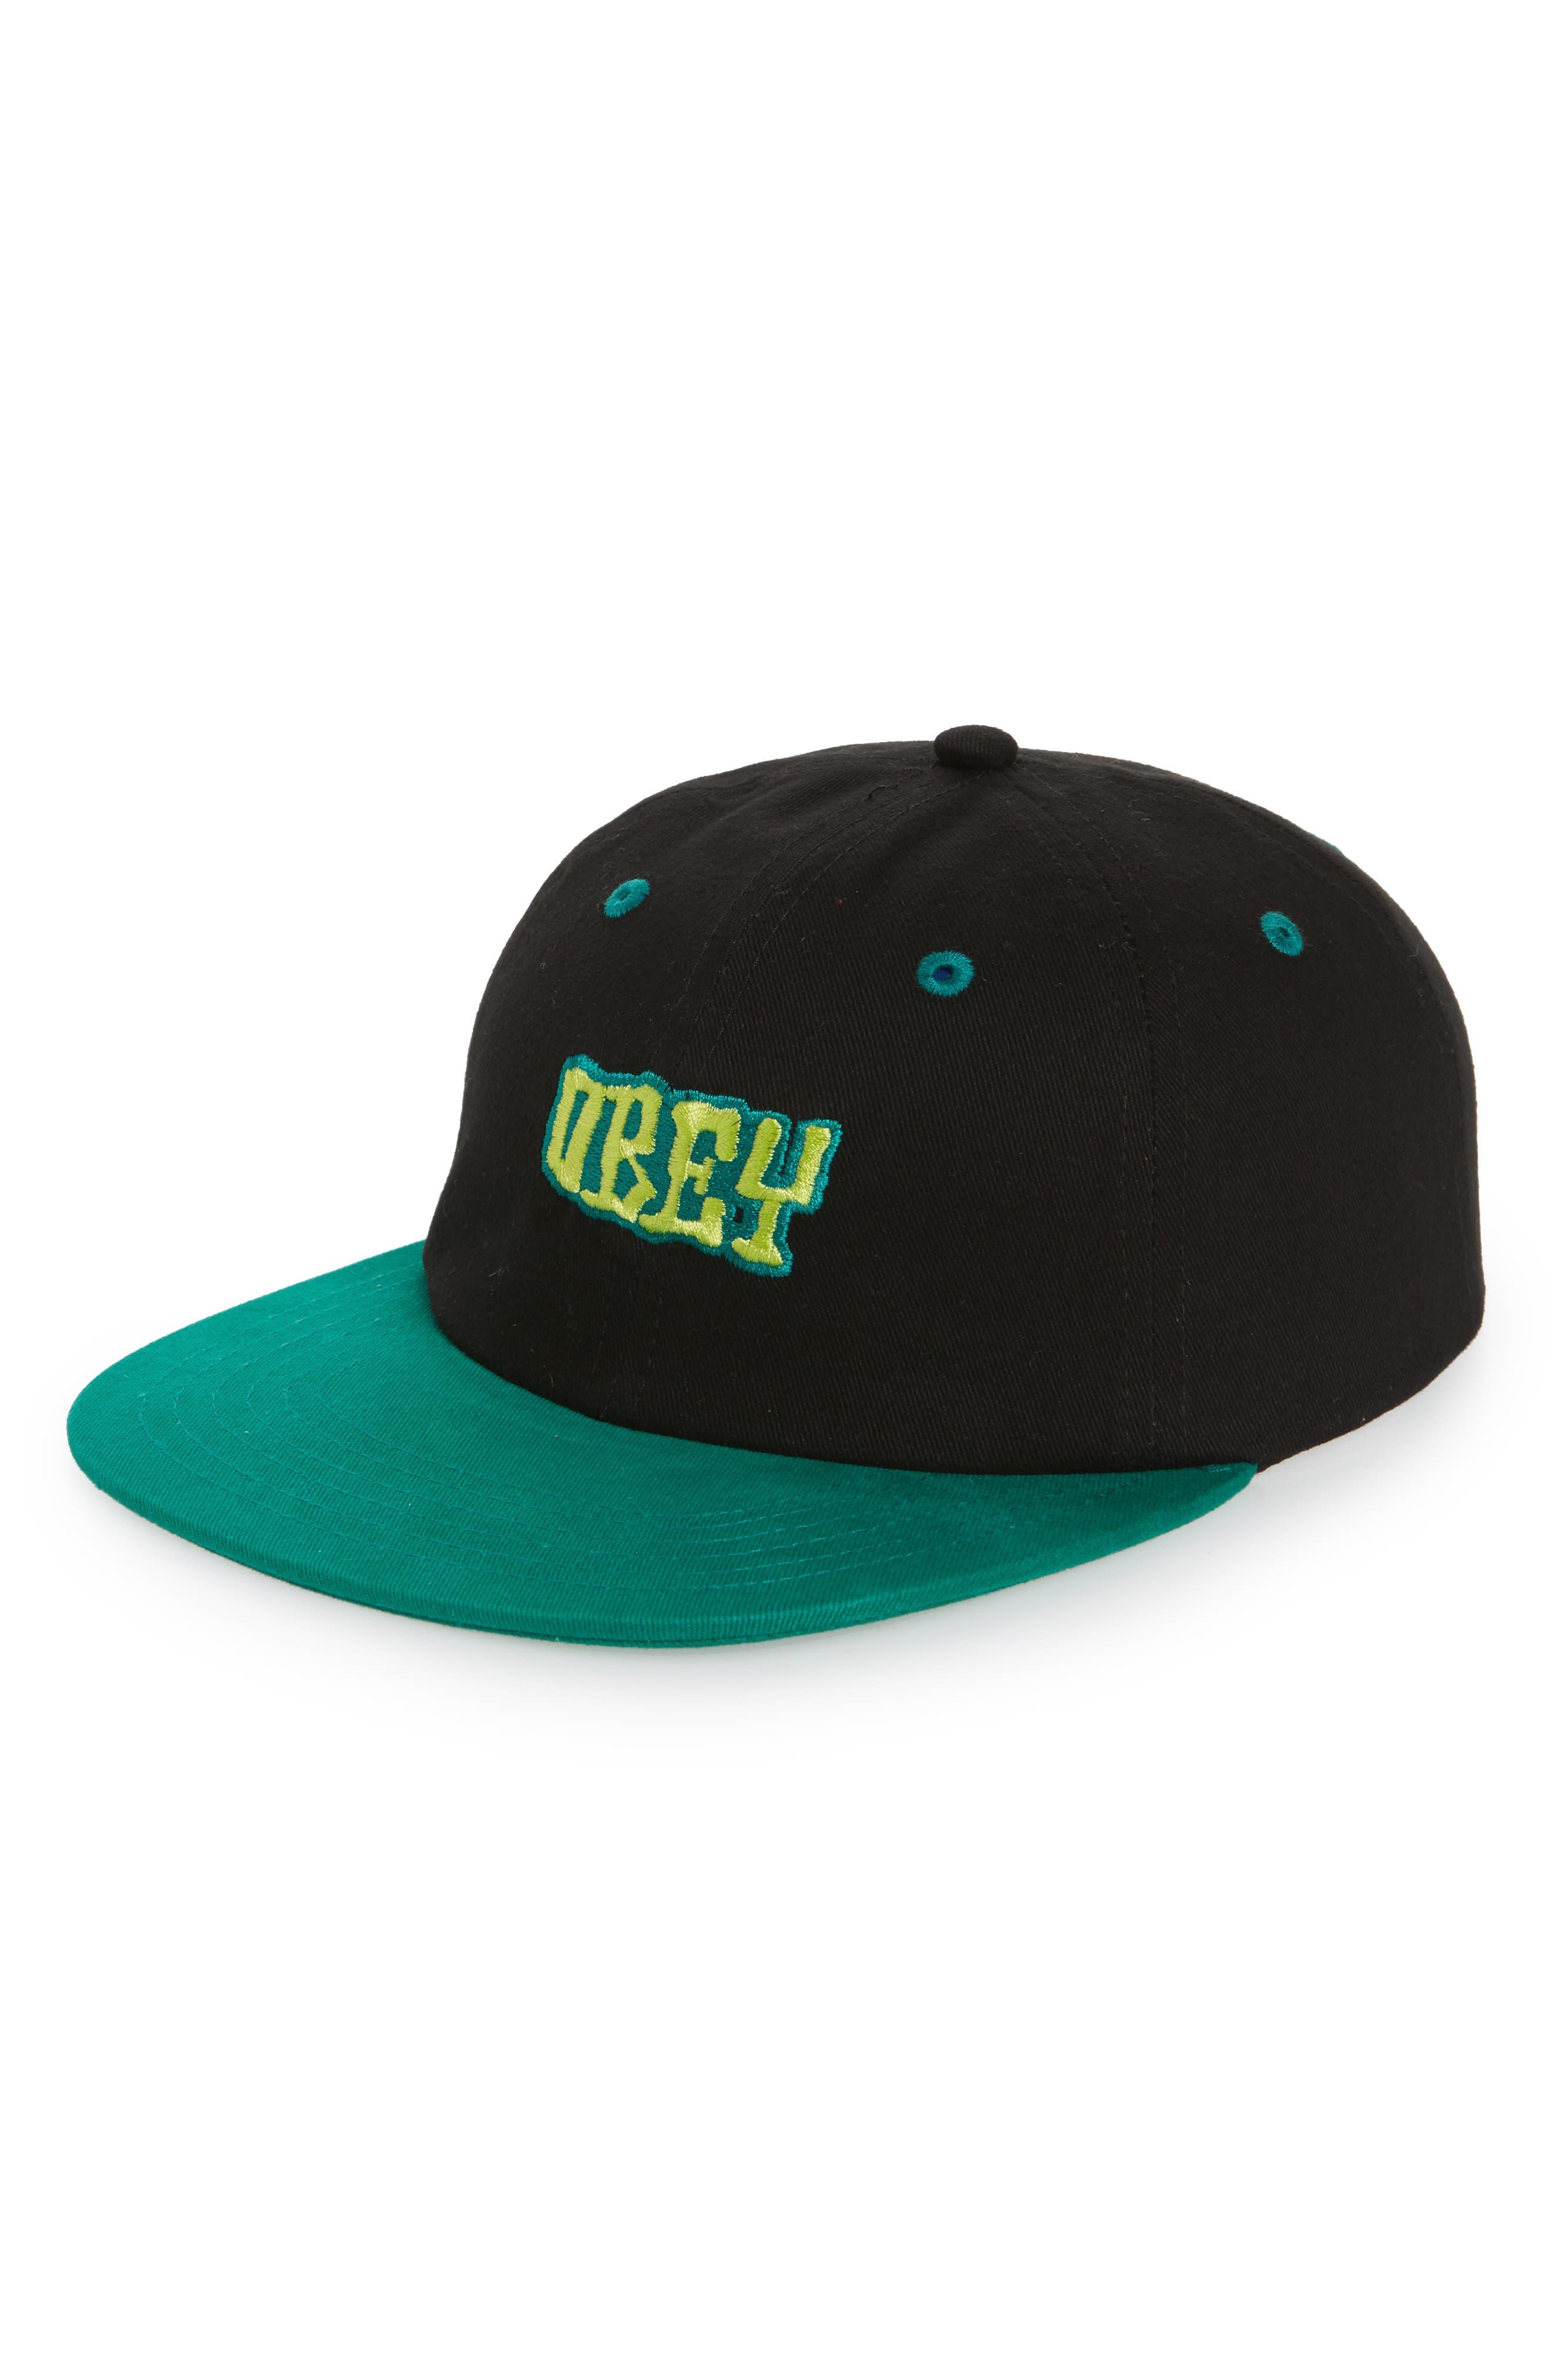 Better Days Snapback Cap,                         Main,                         color, Black